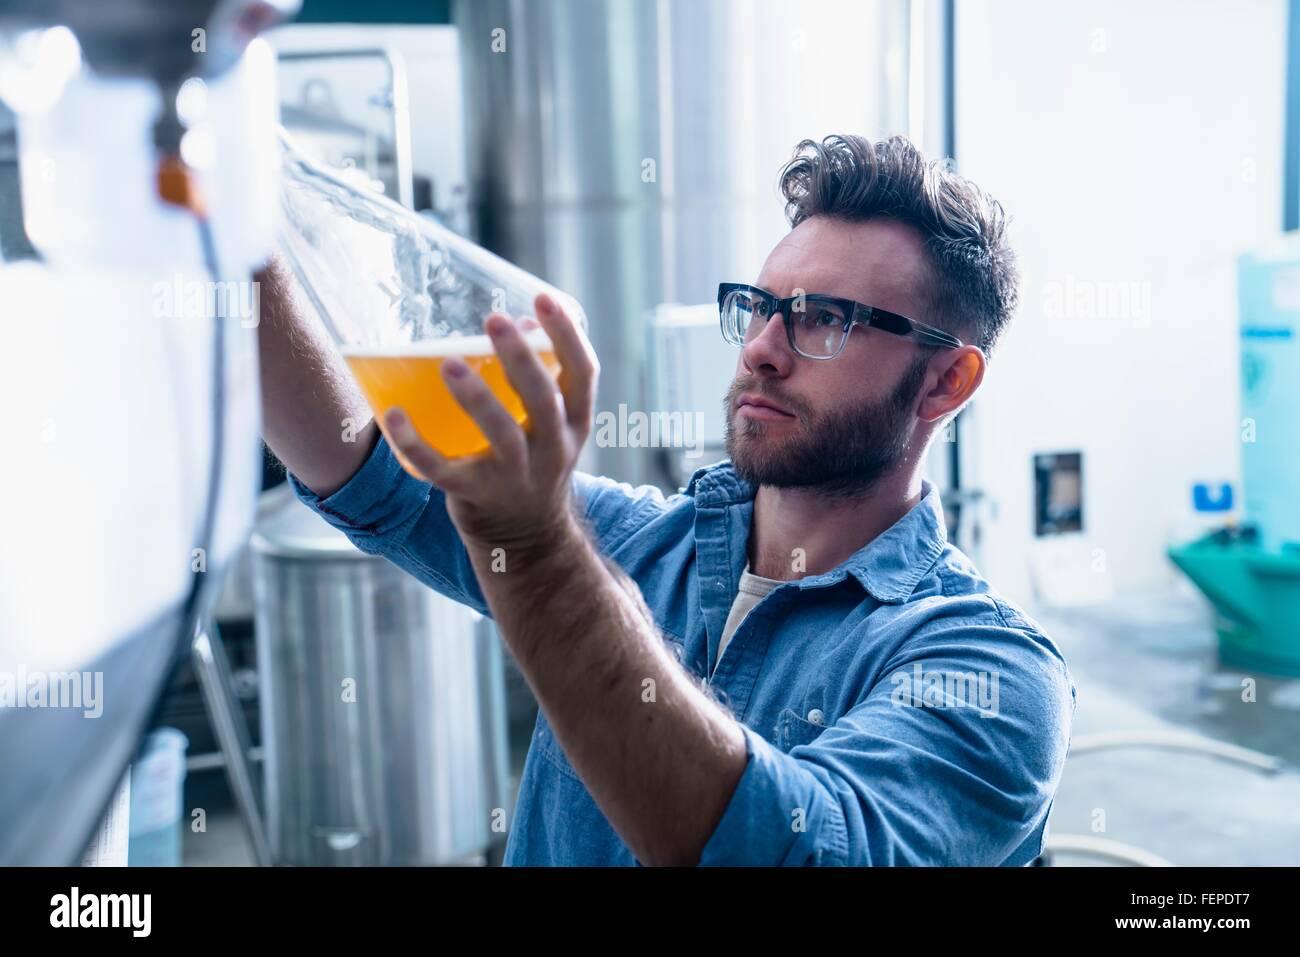 Junger Mann in Brauerei Füllung Kolben mit Bier Stockbild